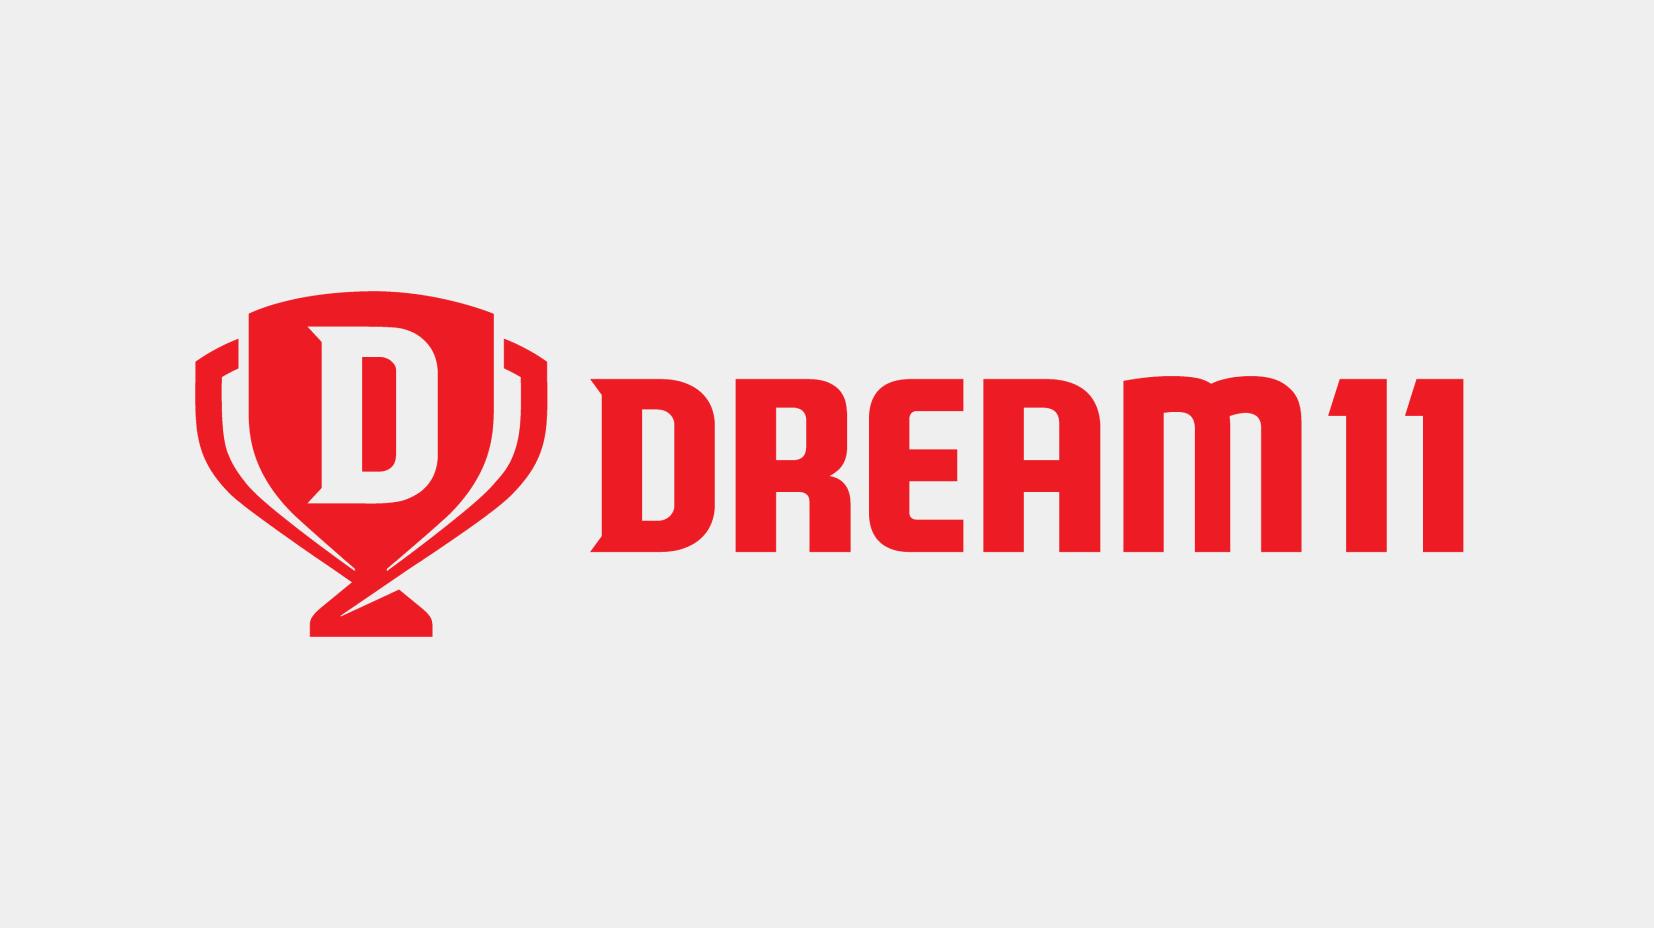 Tech & Product DD | Growth | Code & Co. advises TCV on Dream Sports (Dream11)